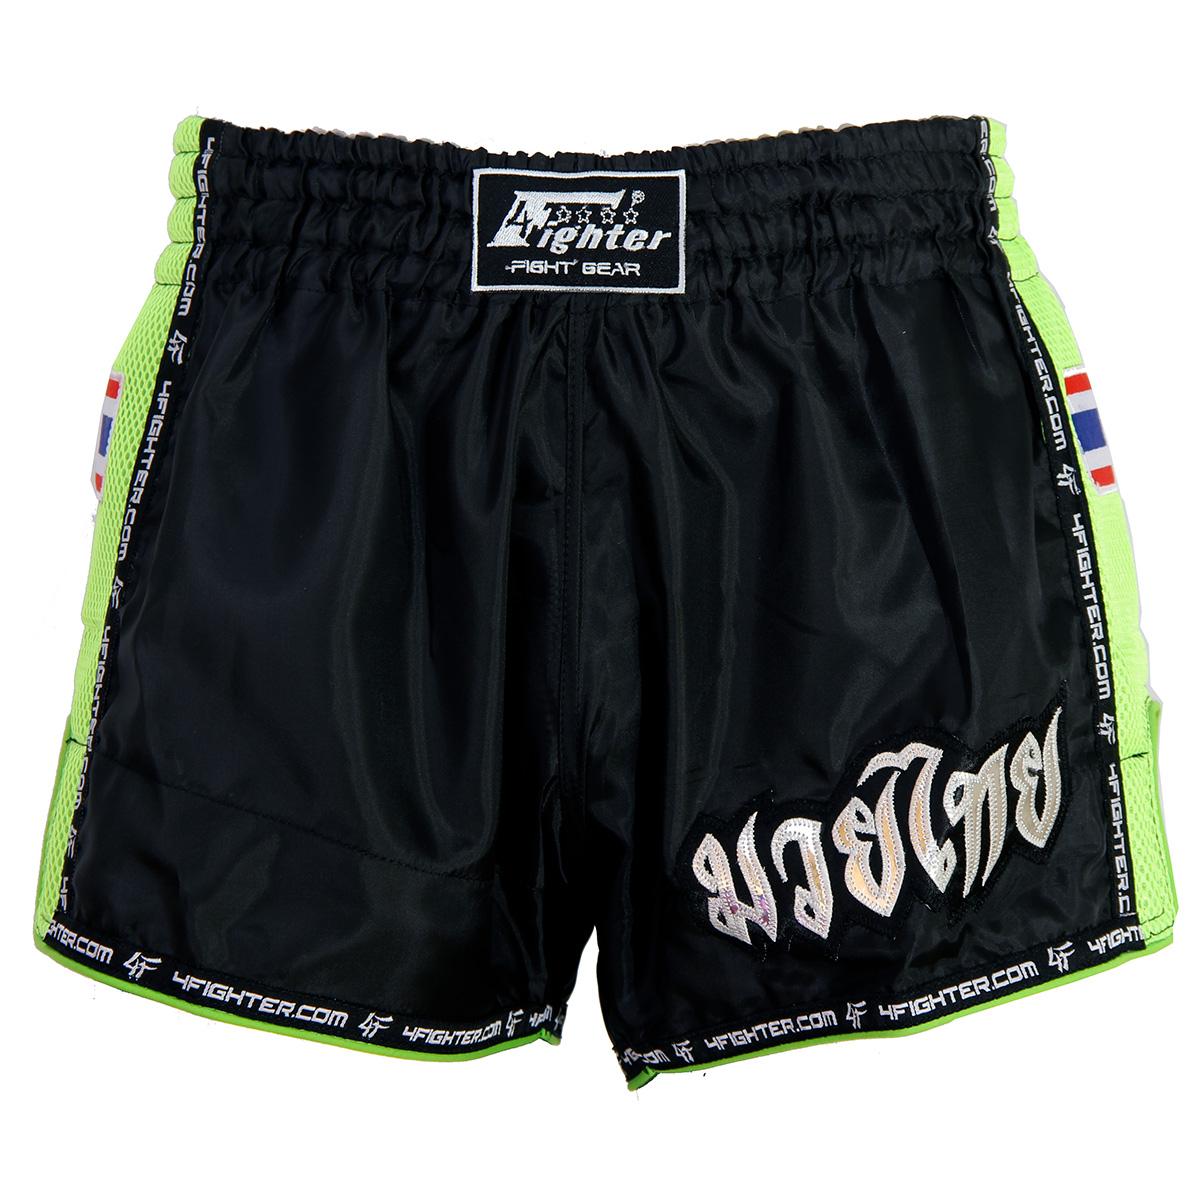 4Fighter Low Waist Muay Thai / Kickboxhose schwarz Nylon mit grünem Mesh